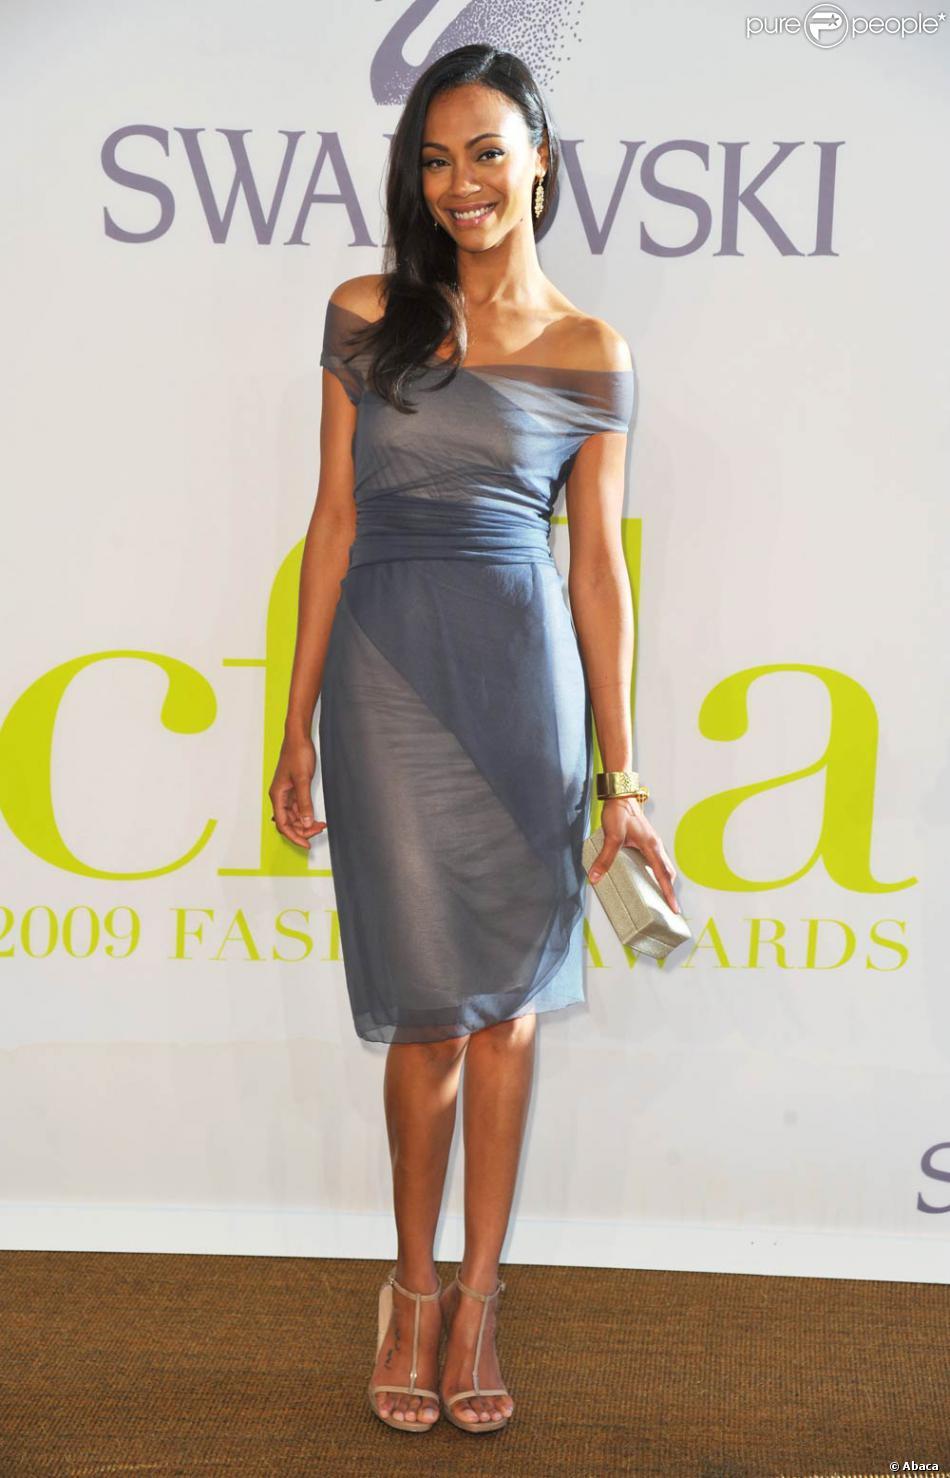 zoe saldana l 39 occasion des cfda fashion awards qui se sont tenus au alice tully hall de new. Black Bedroom Furniture Sets. Home Design Ideas